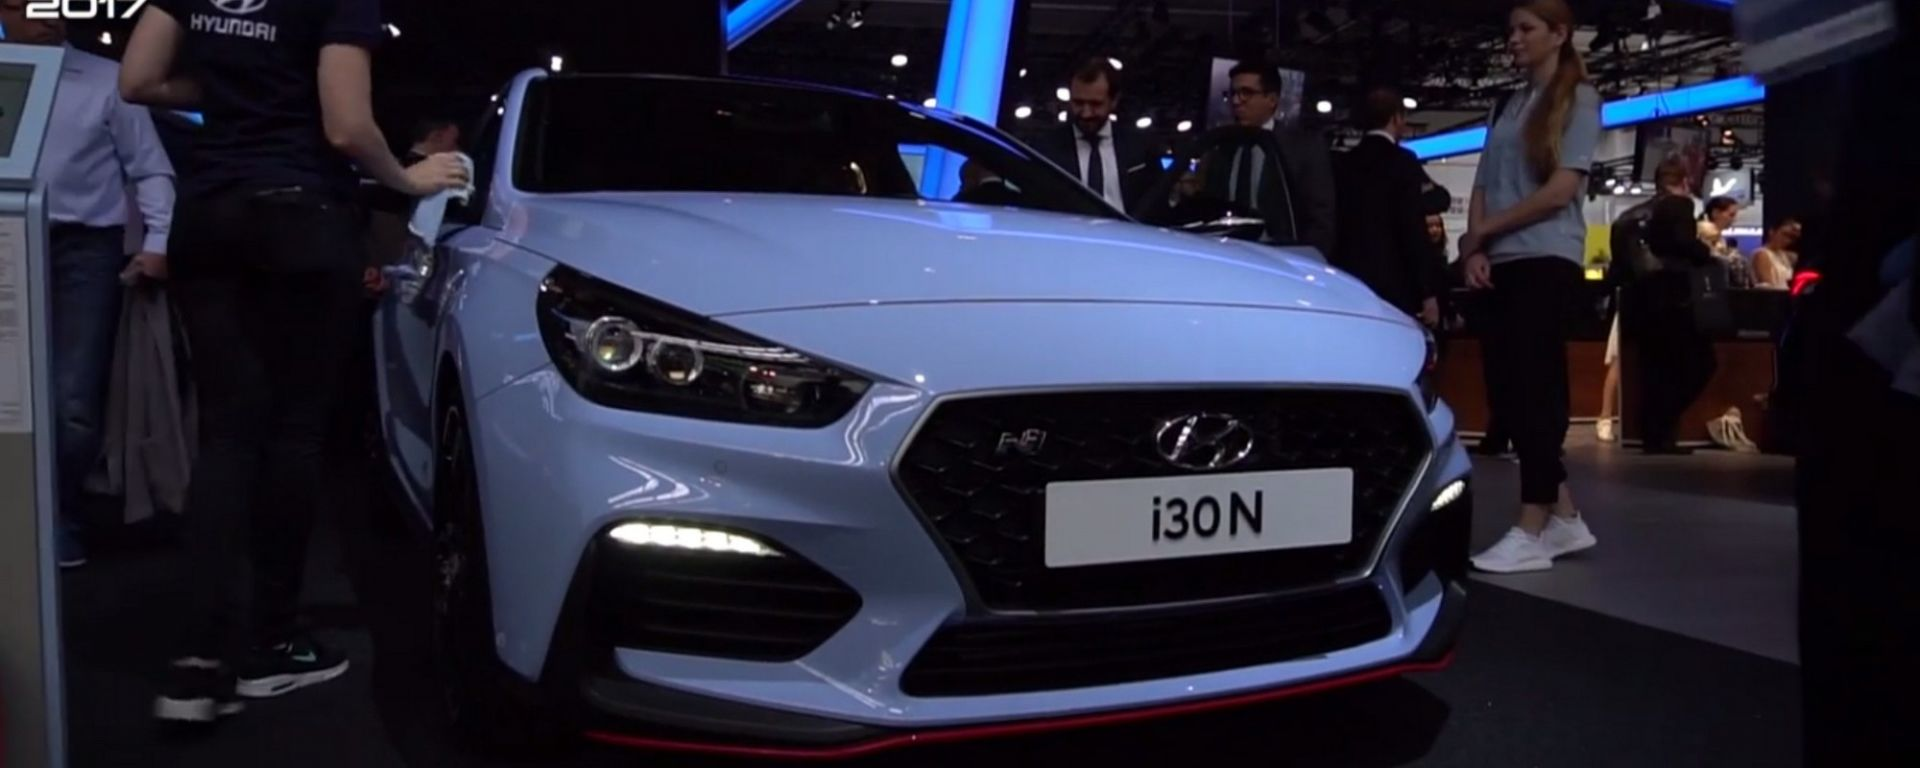 Hyundai i30 N: la coreana che viene dal Nurburgring